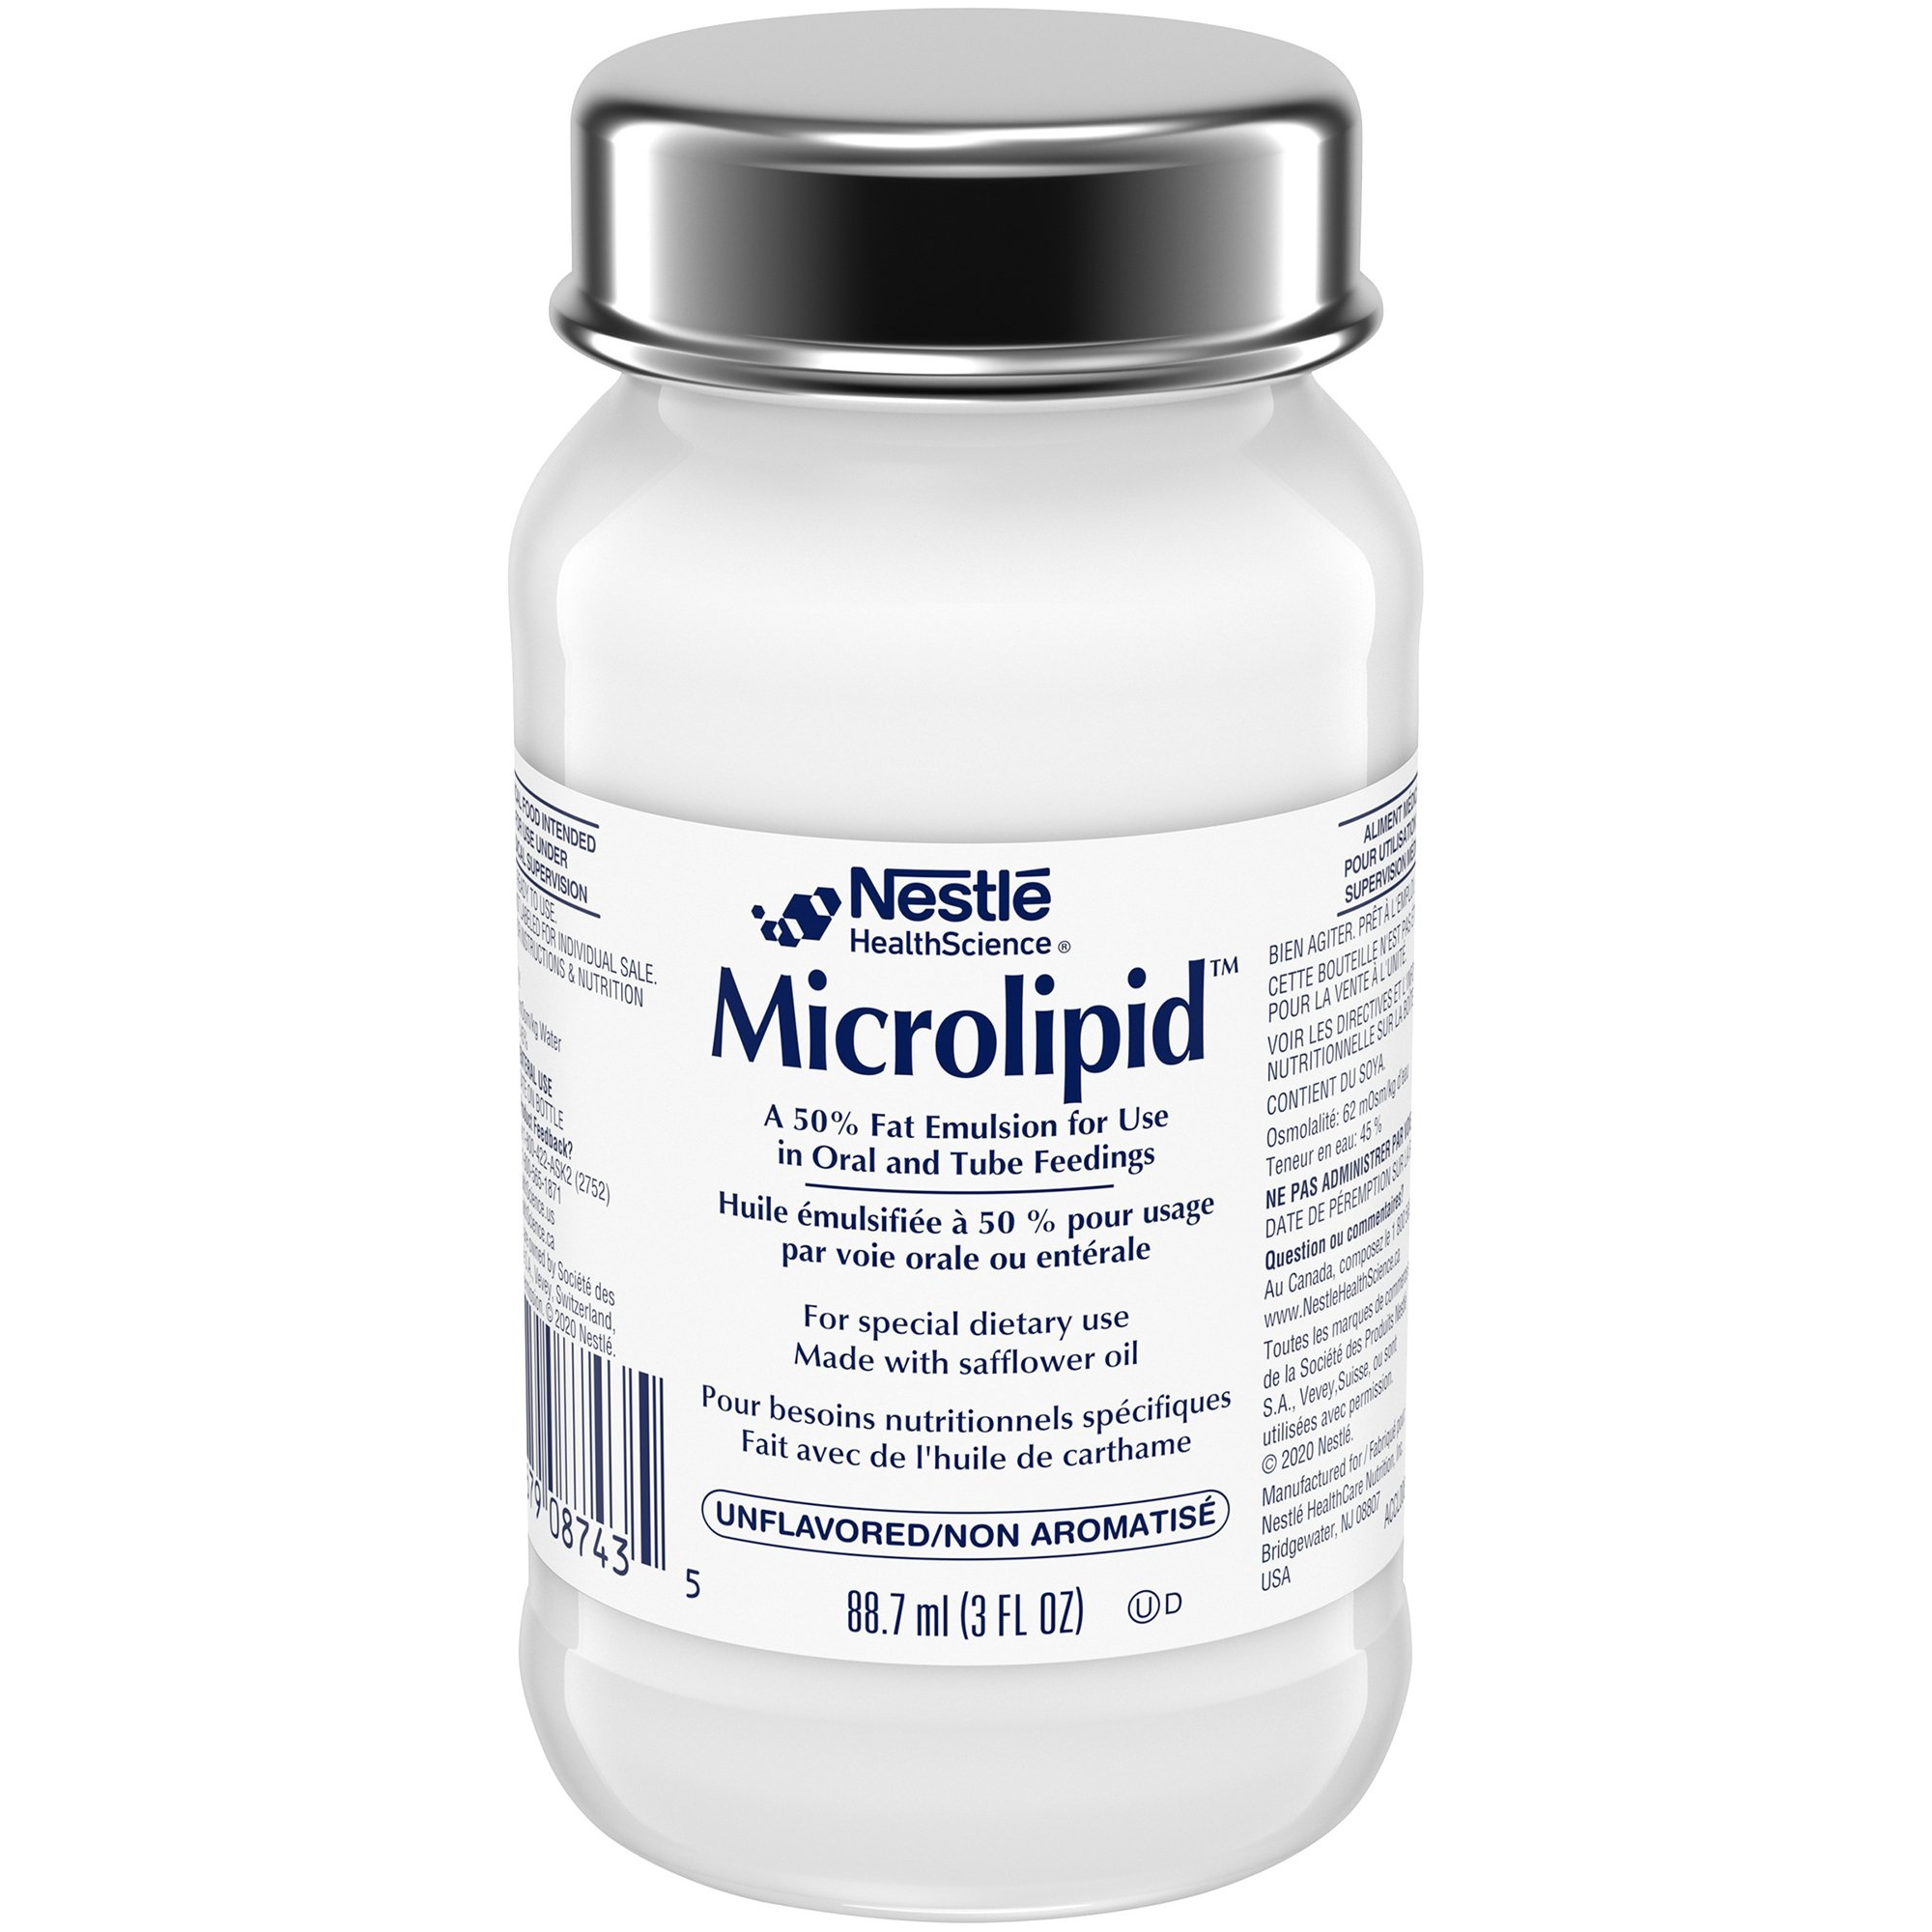 Nestle HealthScience Microlipid, Unflavored, 3 oz., 00041679087022, 1 Bottle